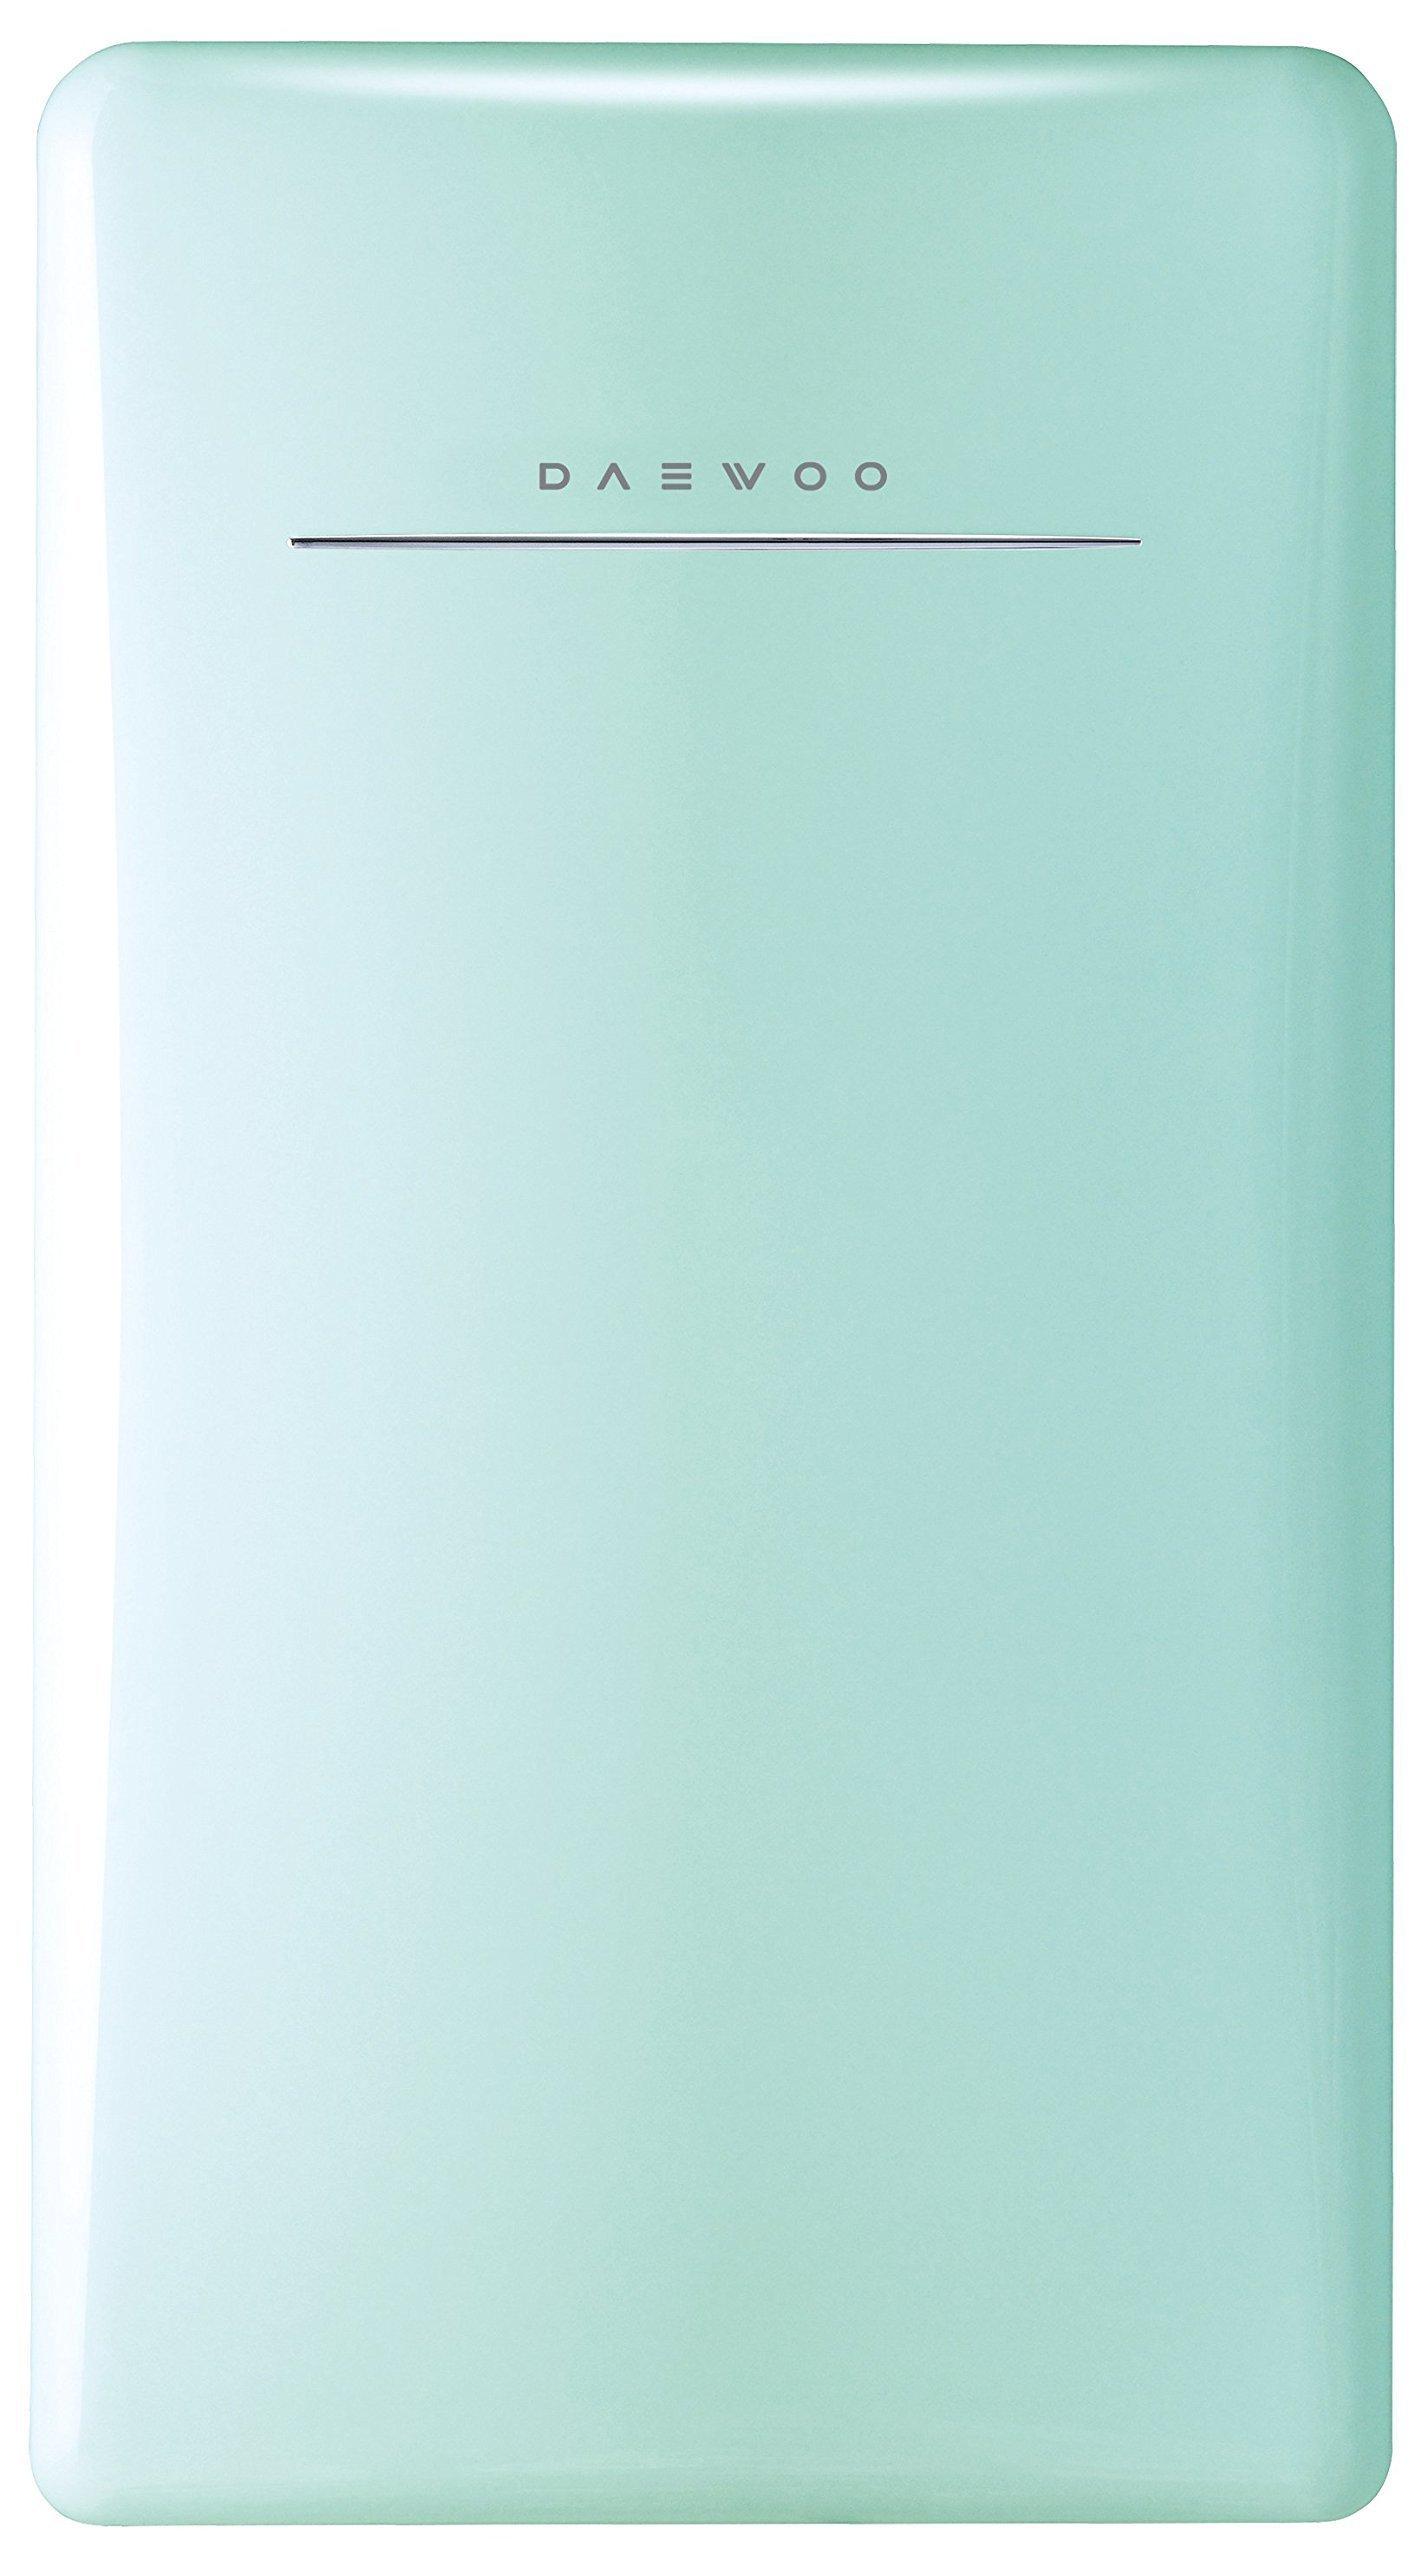 Daewoo - FR-044RCNM - Retro Compact Refrigerator - 4.4 cu. ft., Mint Green